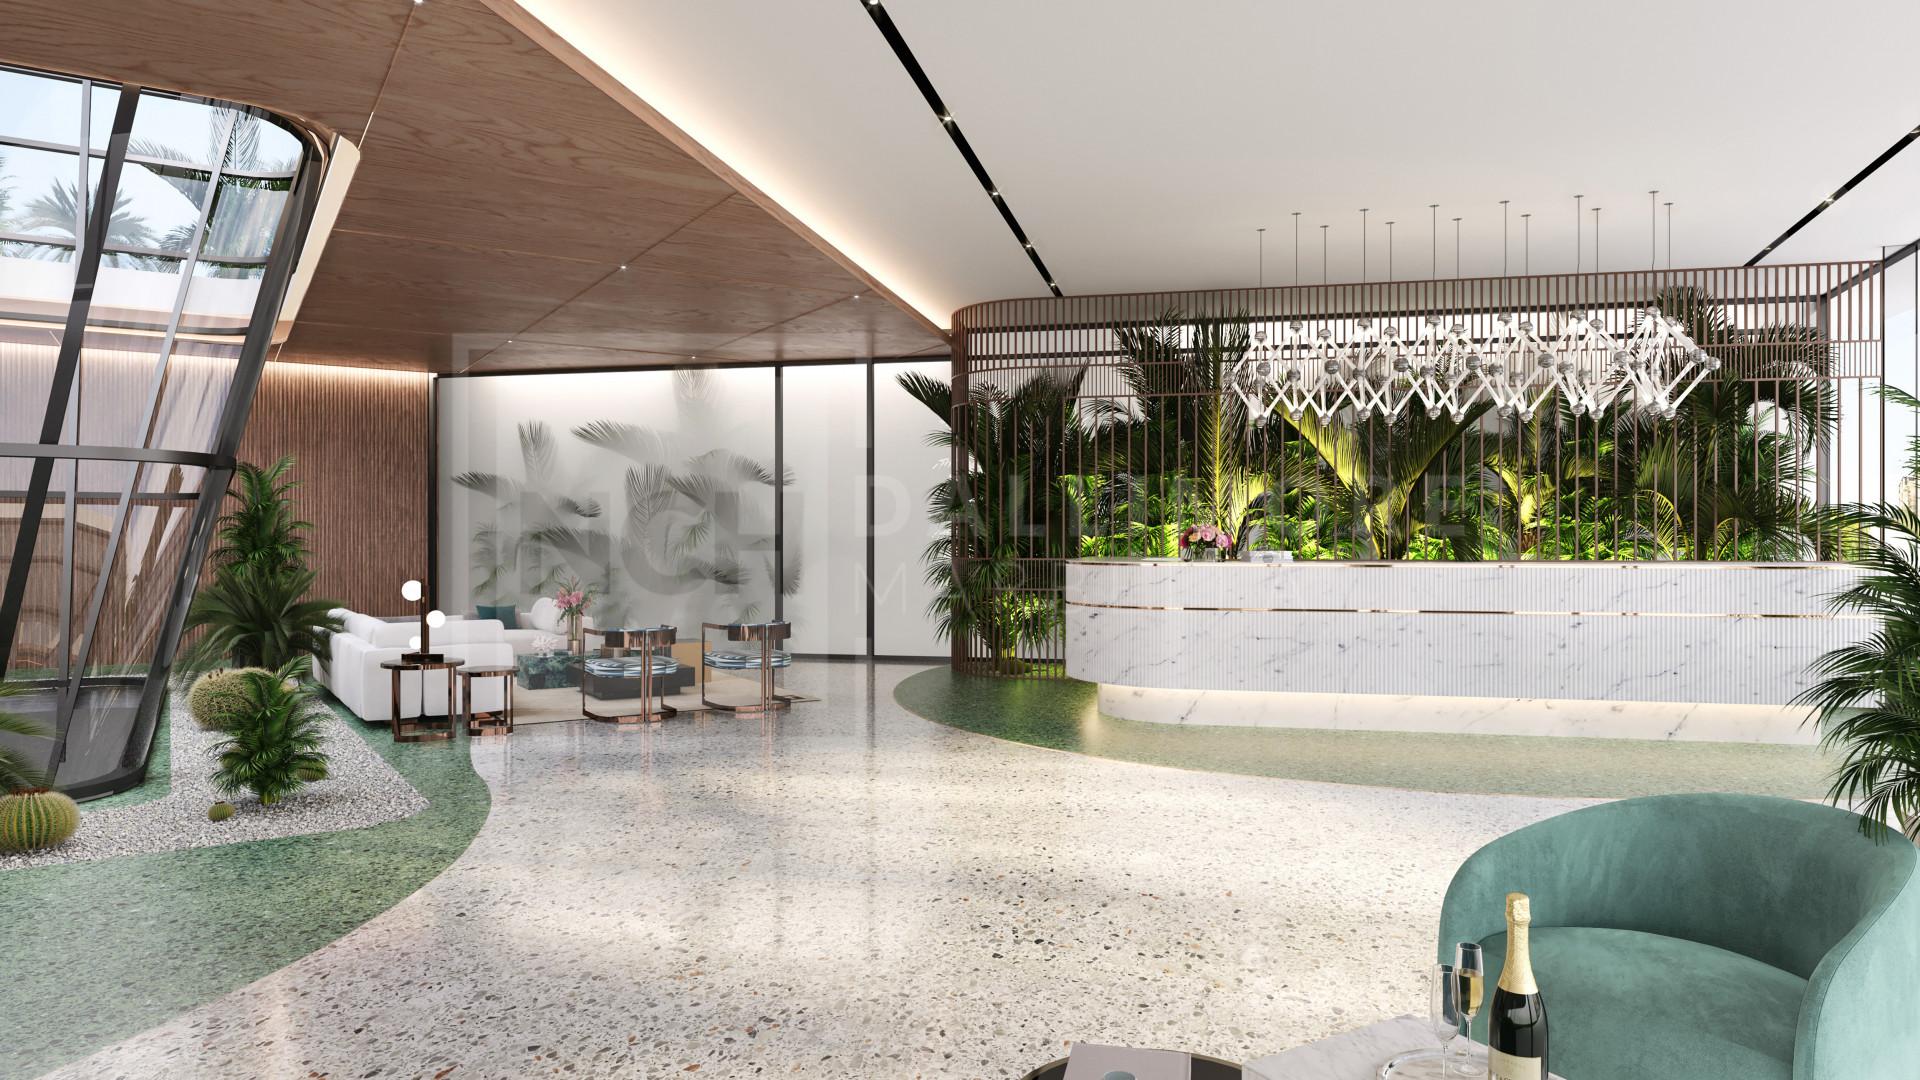 Ground Floor Duplex Golden Mile, Marbella Golden Mile – NEWV6910